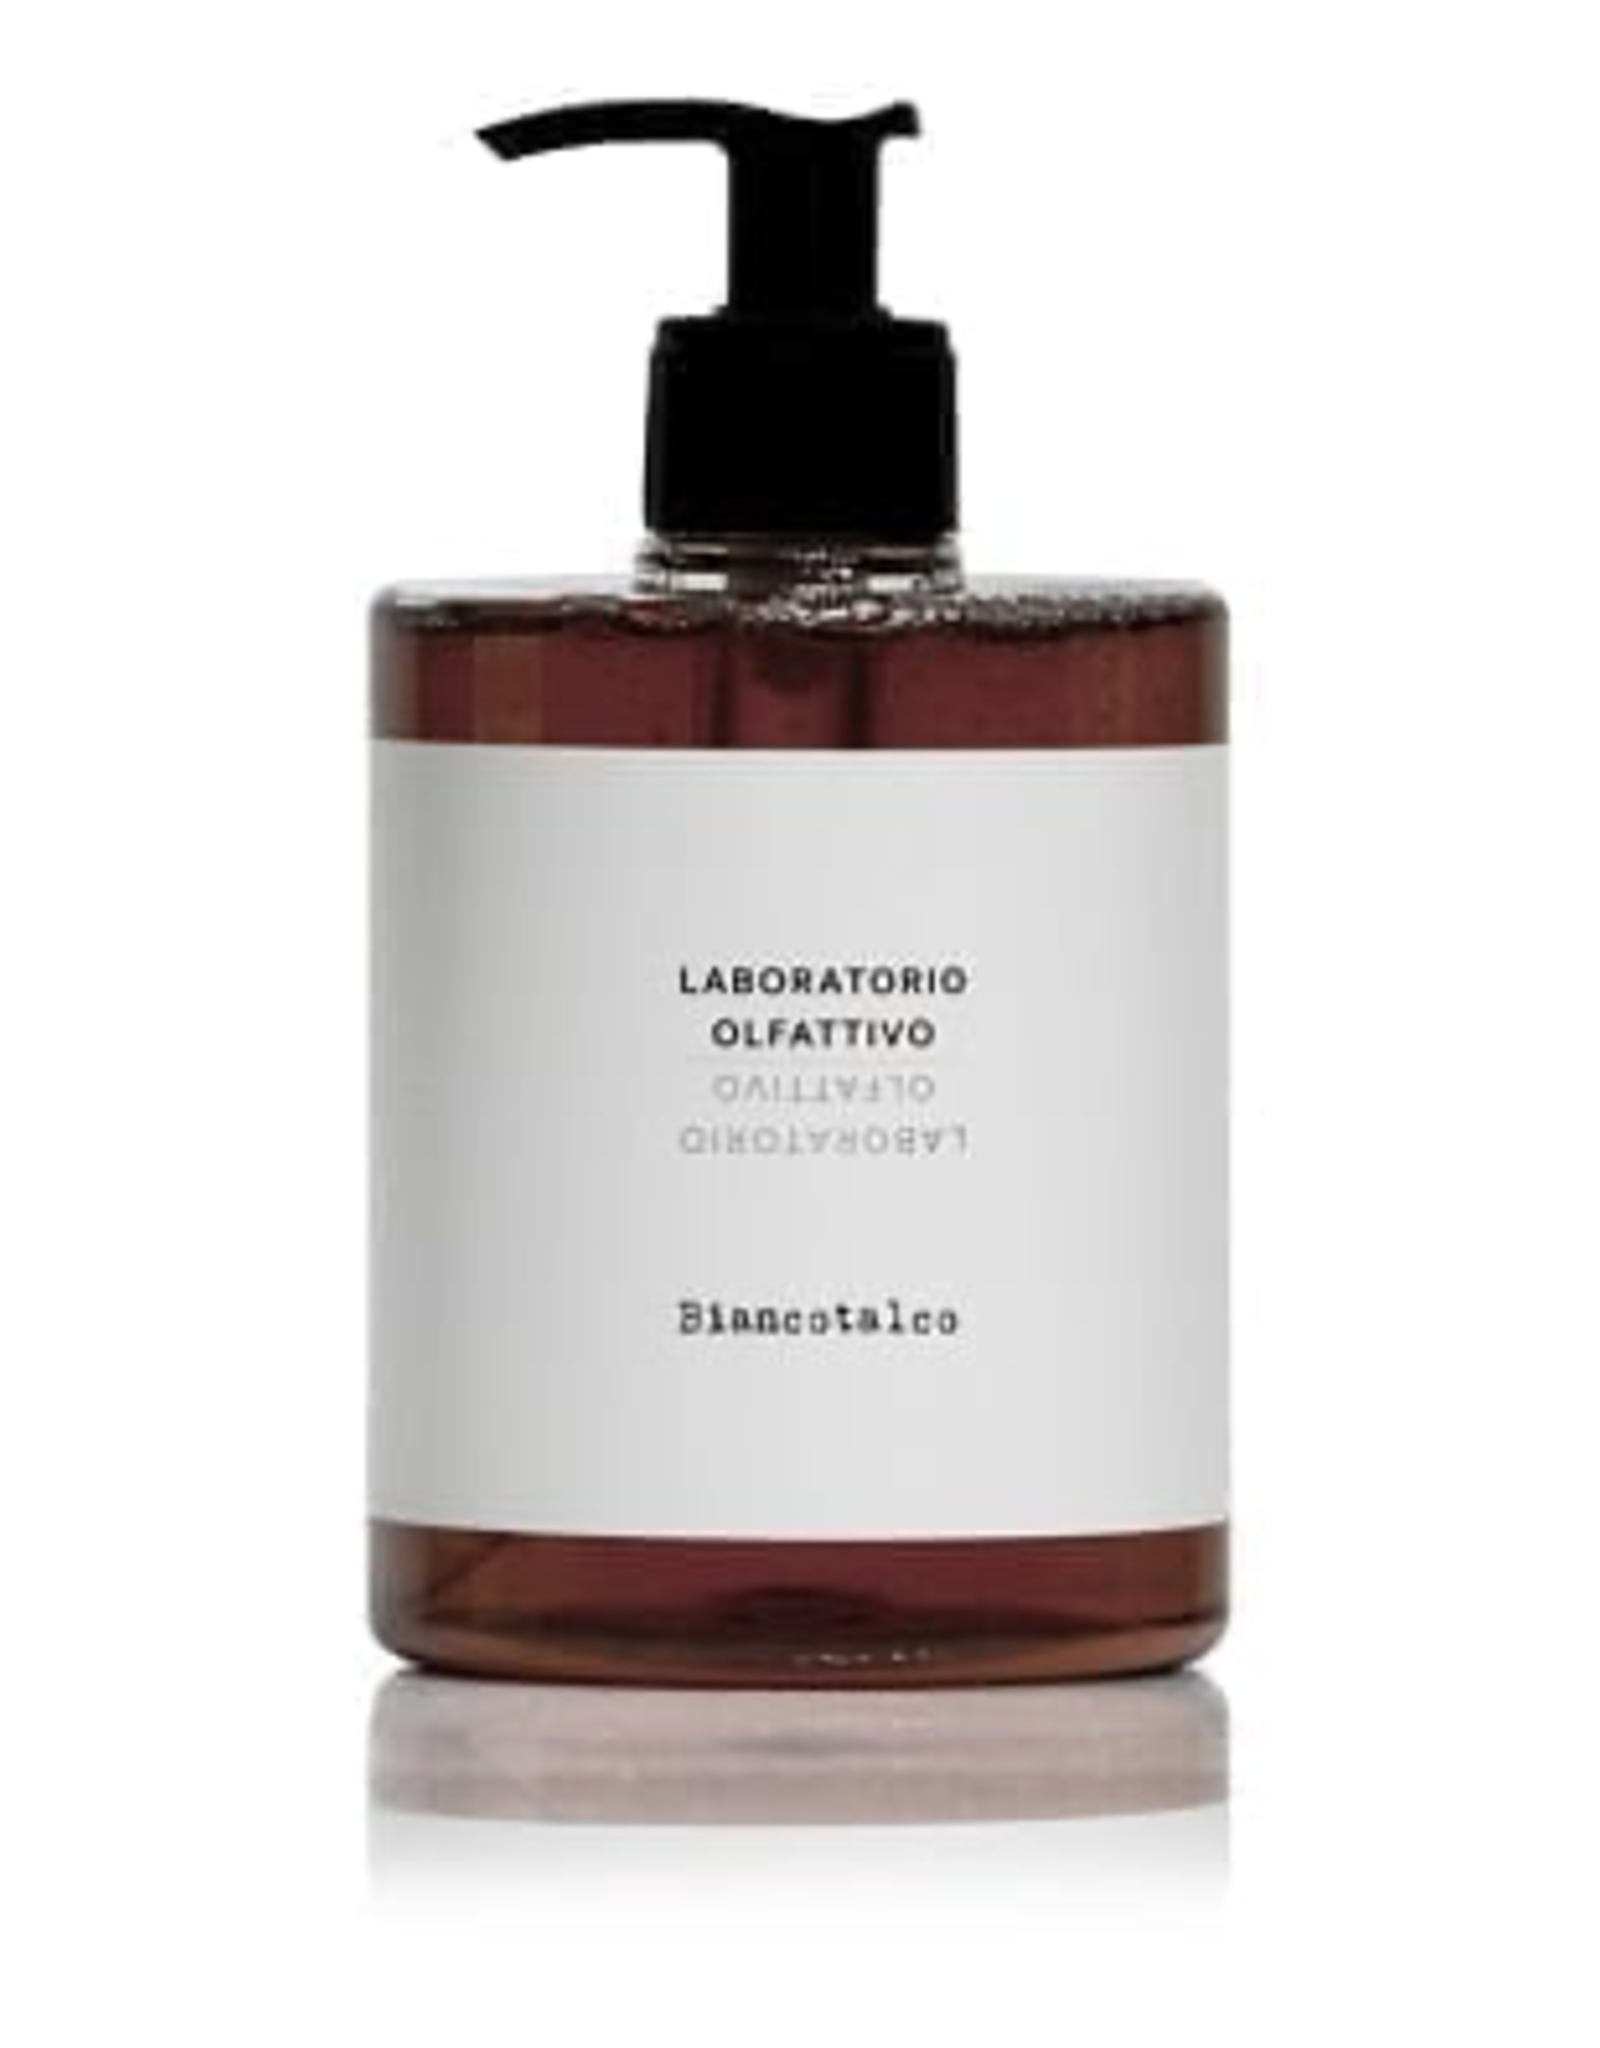 Laboratorio Olfattivo Laboratorio Olfattivo Biancotalco Liquid Soap